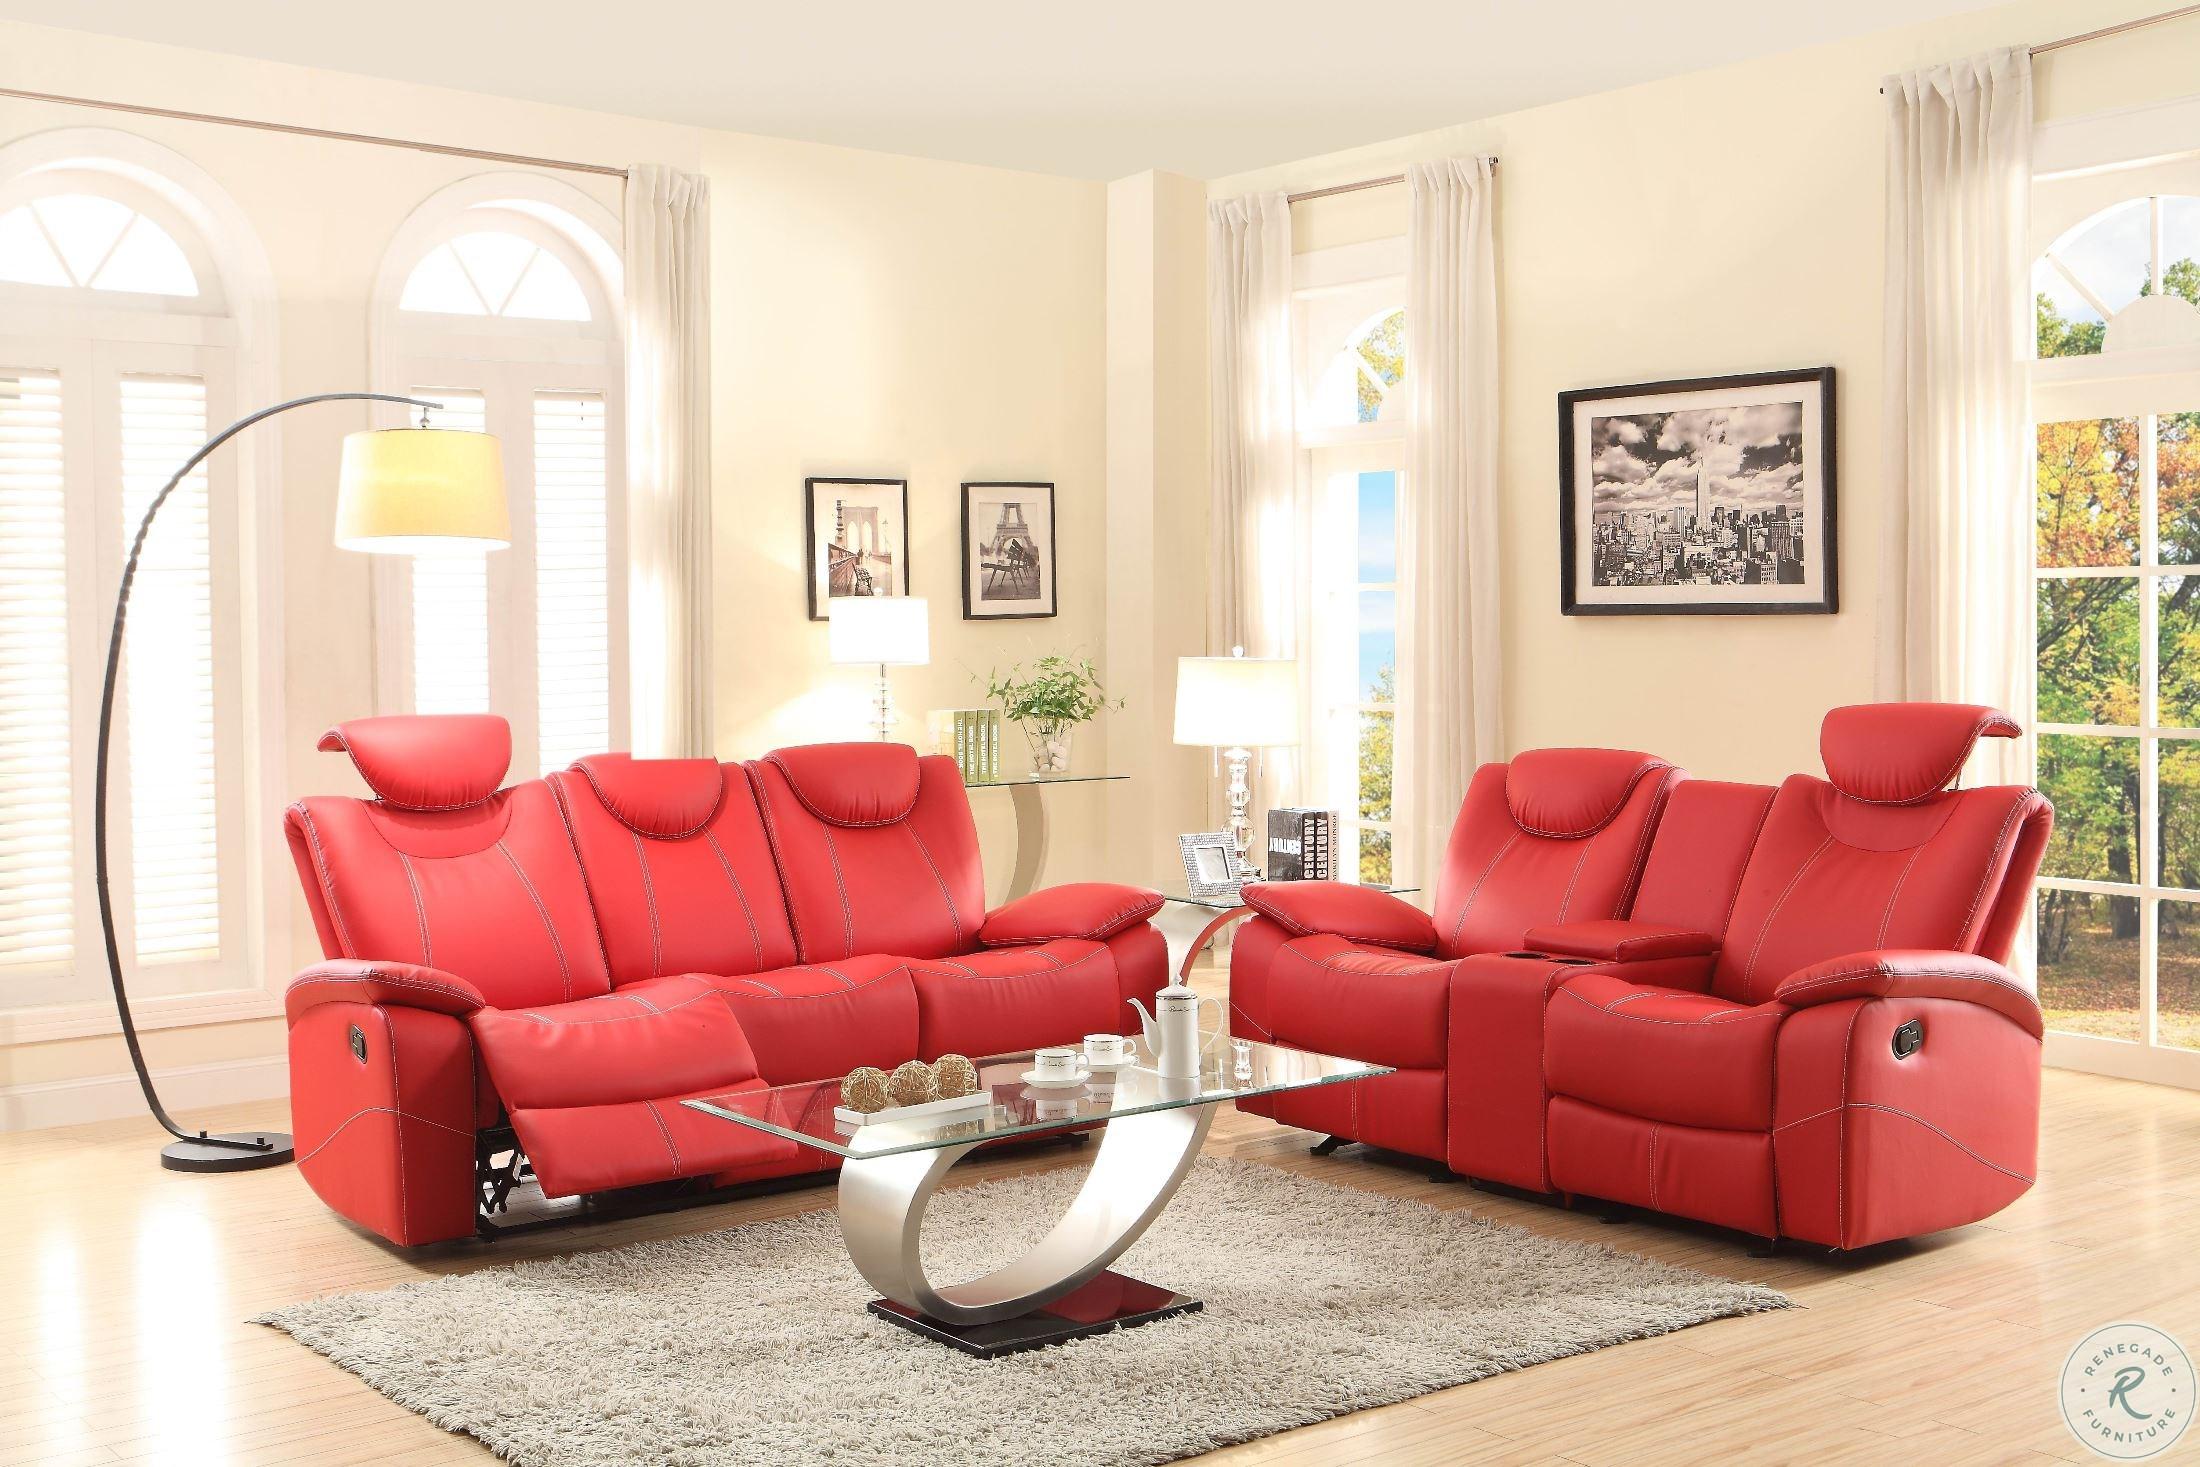 Pleasing Talbot Red Double Glider Reclining Loveseat With Console Inzonedesignstudio Interior Chair Design Inzonedesignstudiocom